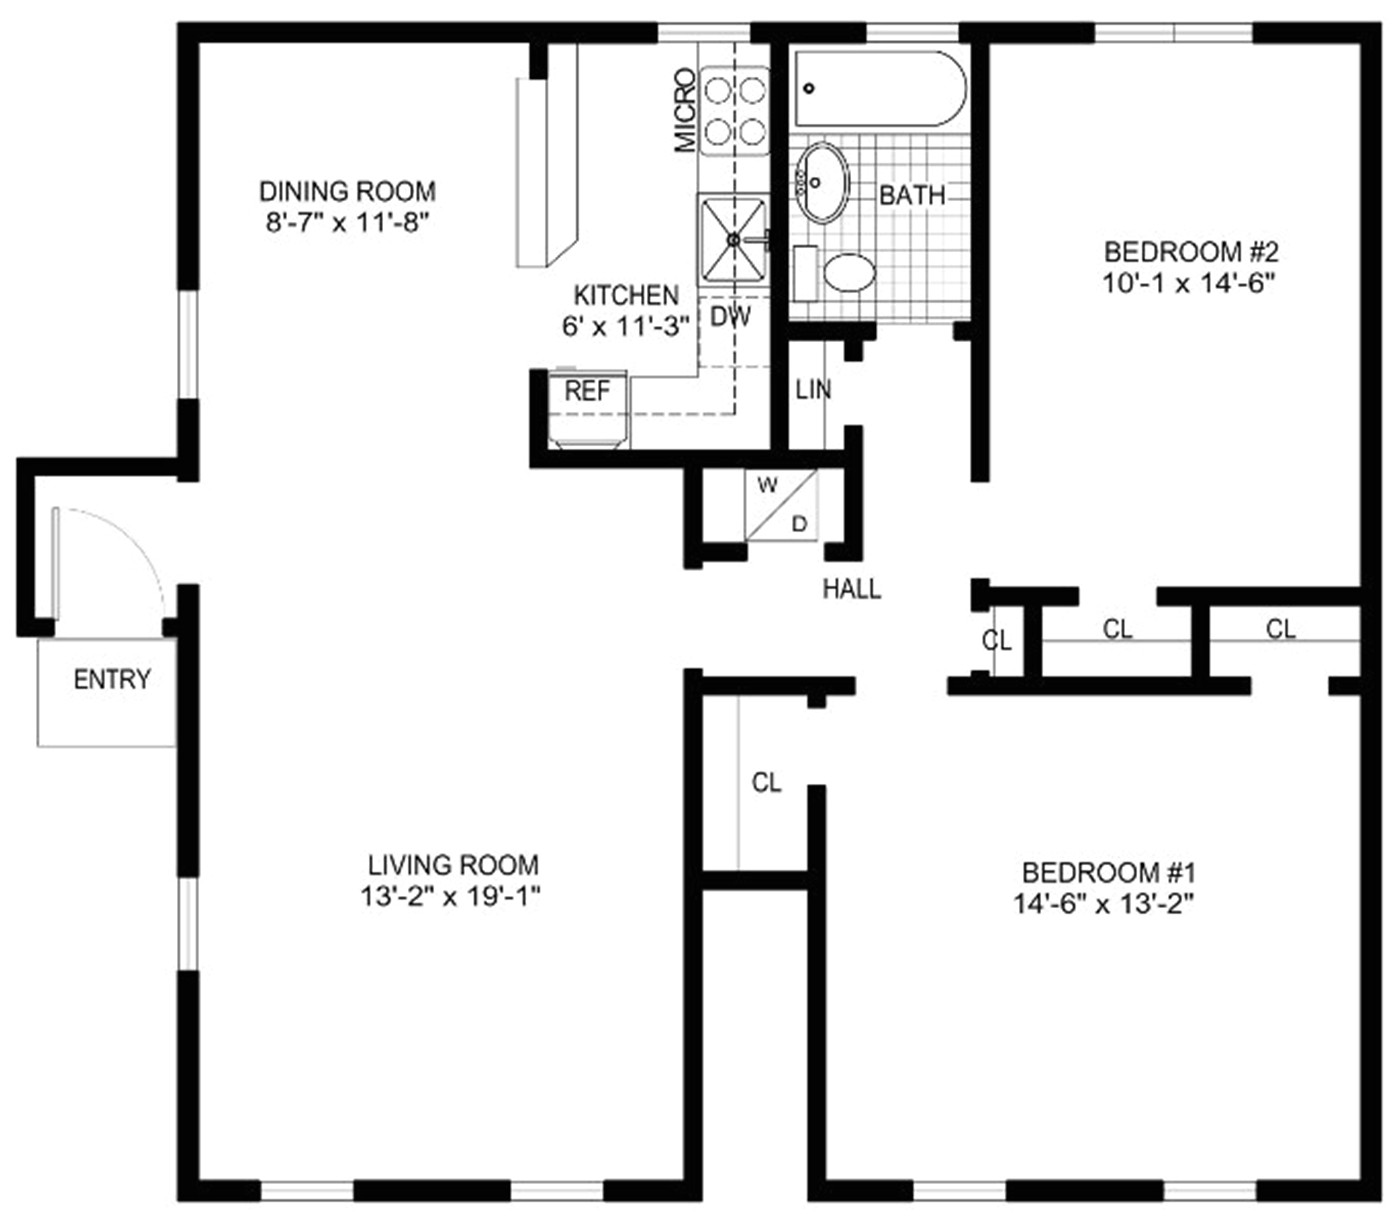 pdf diy printable furniture templates for floor plans download pop up tv stand plans